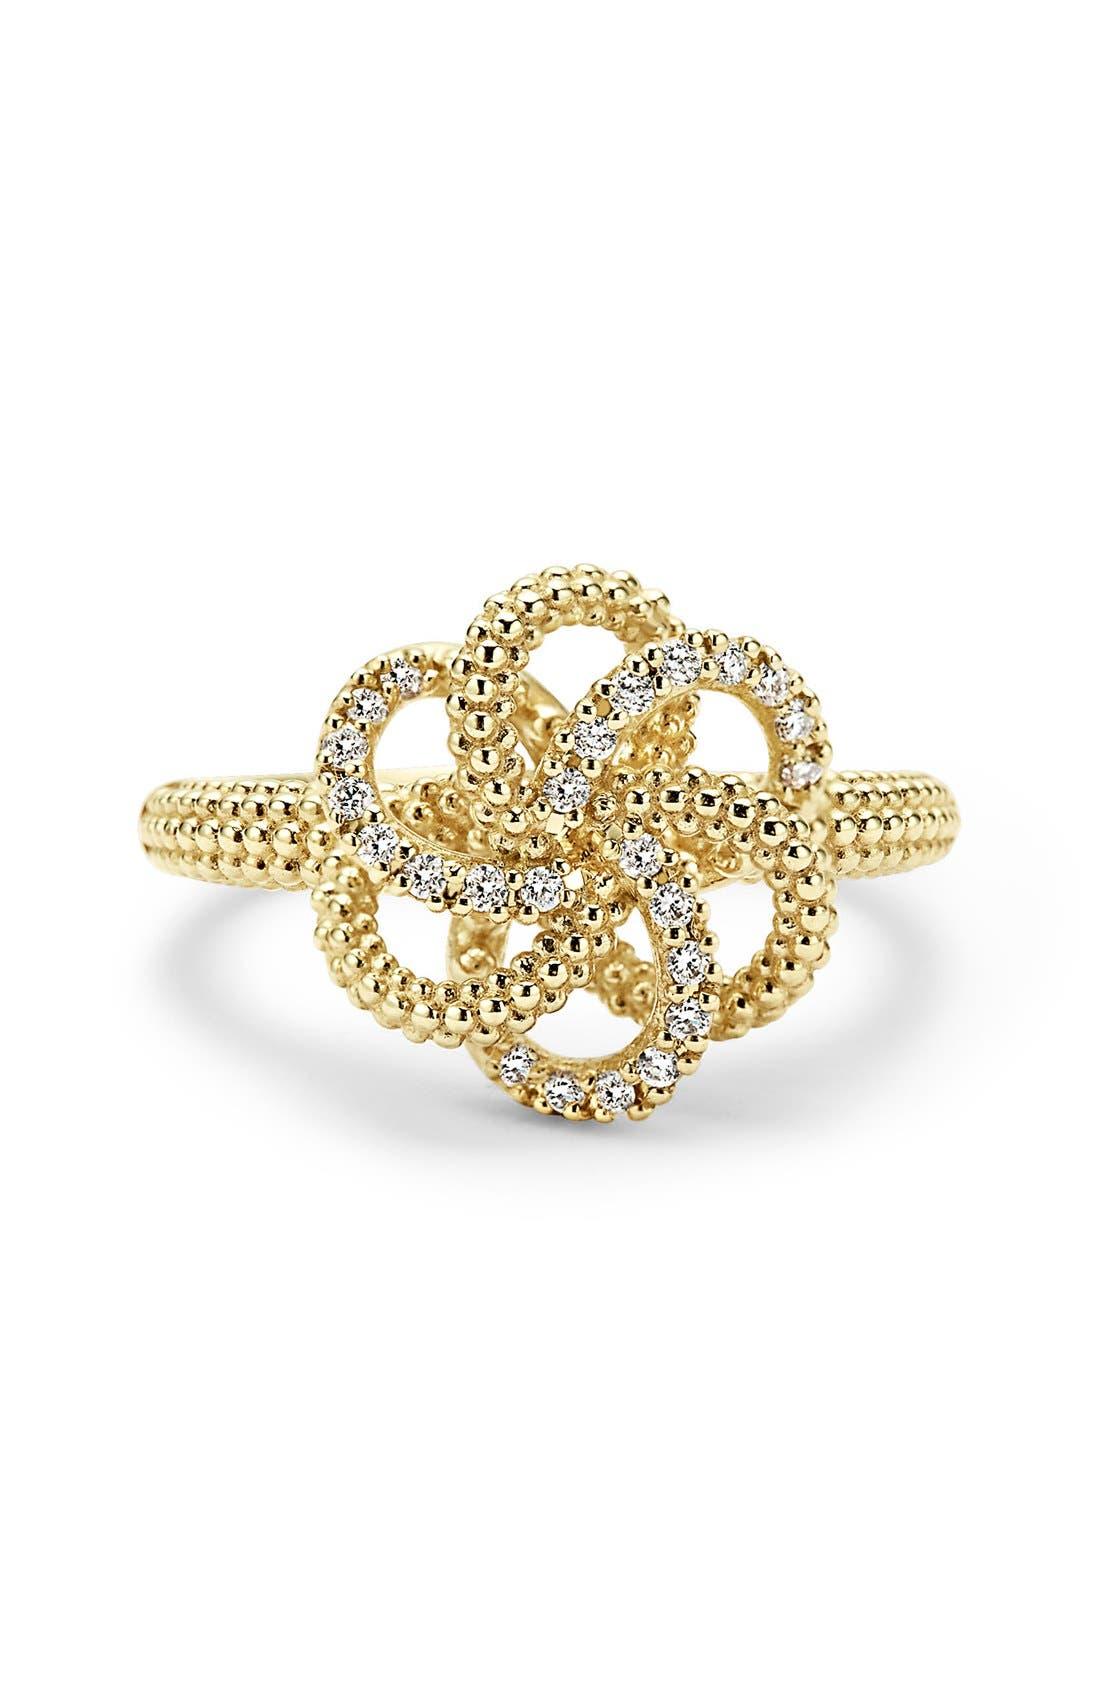 'Love Knot' Diamond Ring,                             Alternate thumbnail 6, color,                             GOLD